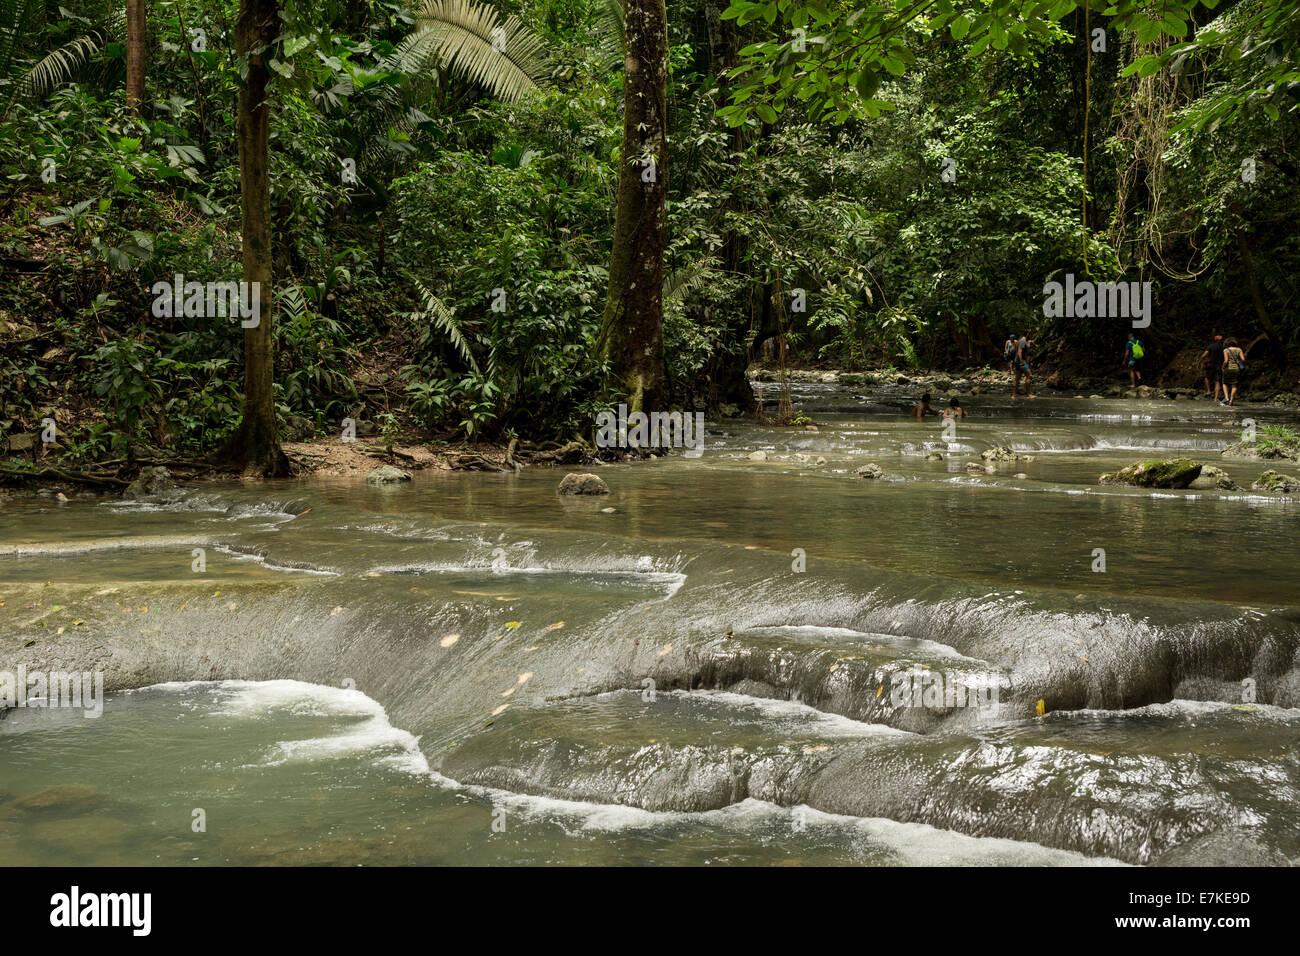 Los Siete Altares waterfall, Paraje Quehueche, Lívingston Guatemala - Stock Image